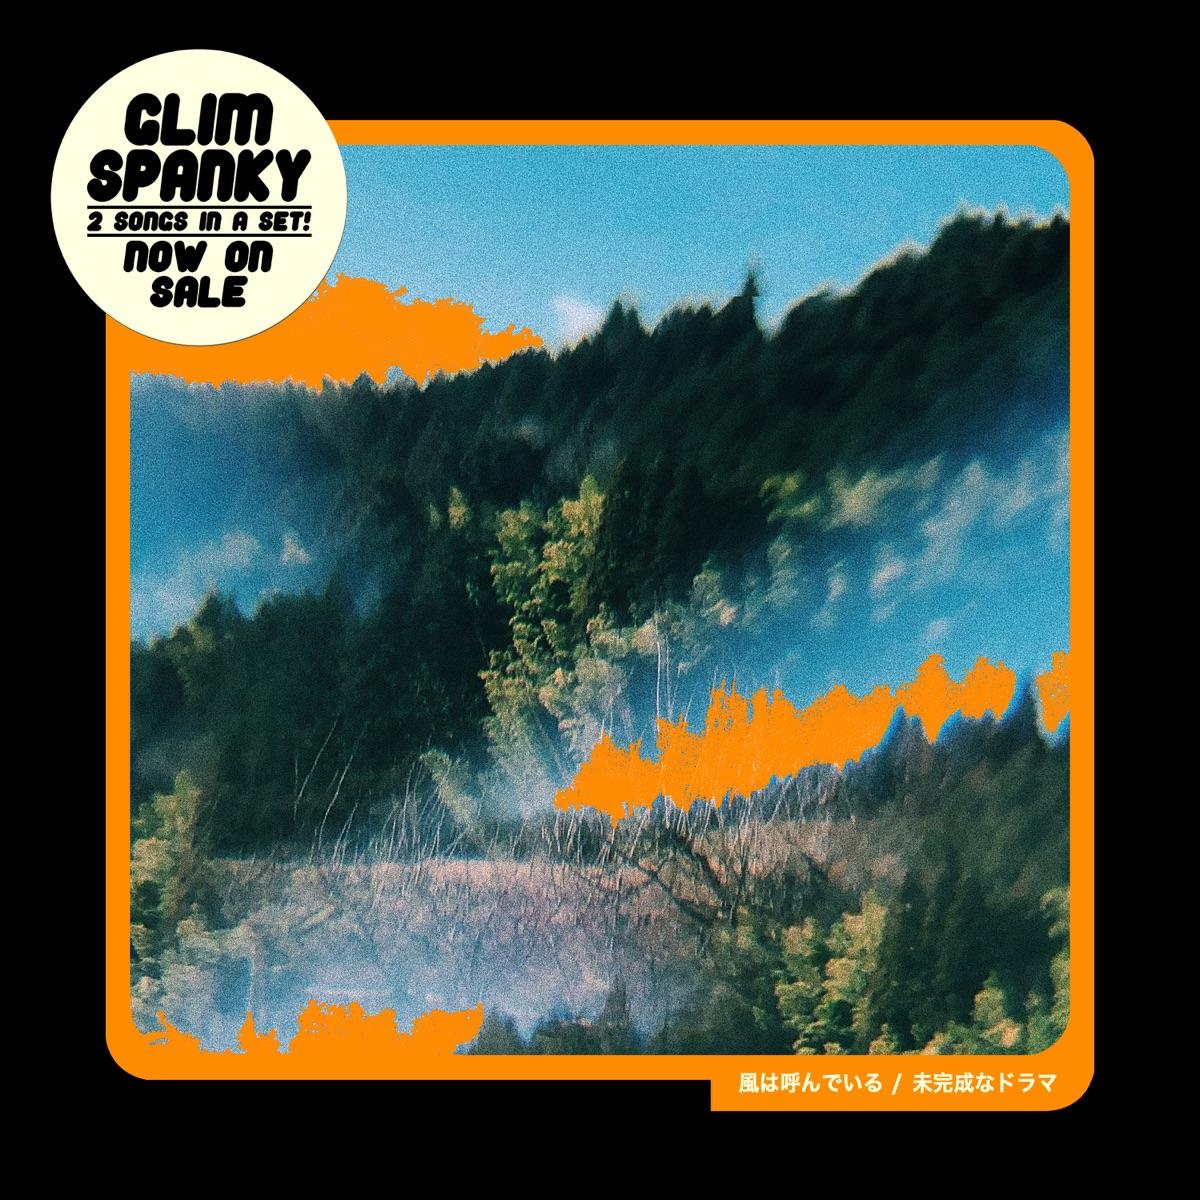 『GLIM SPANKY - 風は呼んでいる』収録の『風は呼んでいる / 未完成なドラマ』ジャケット